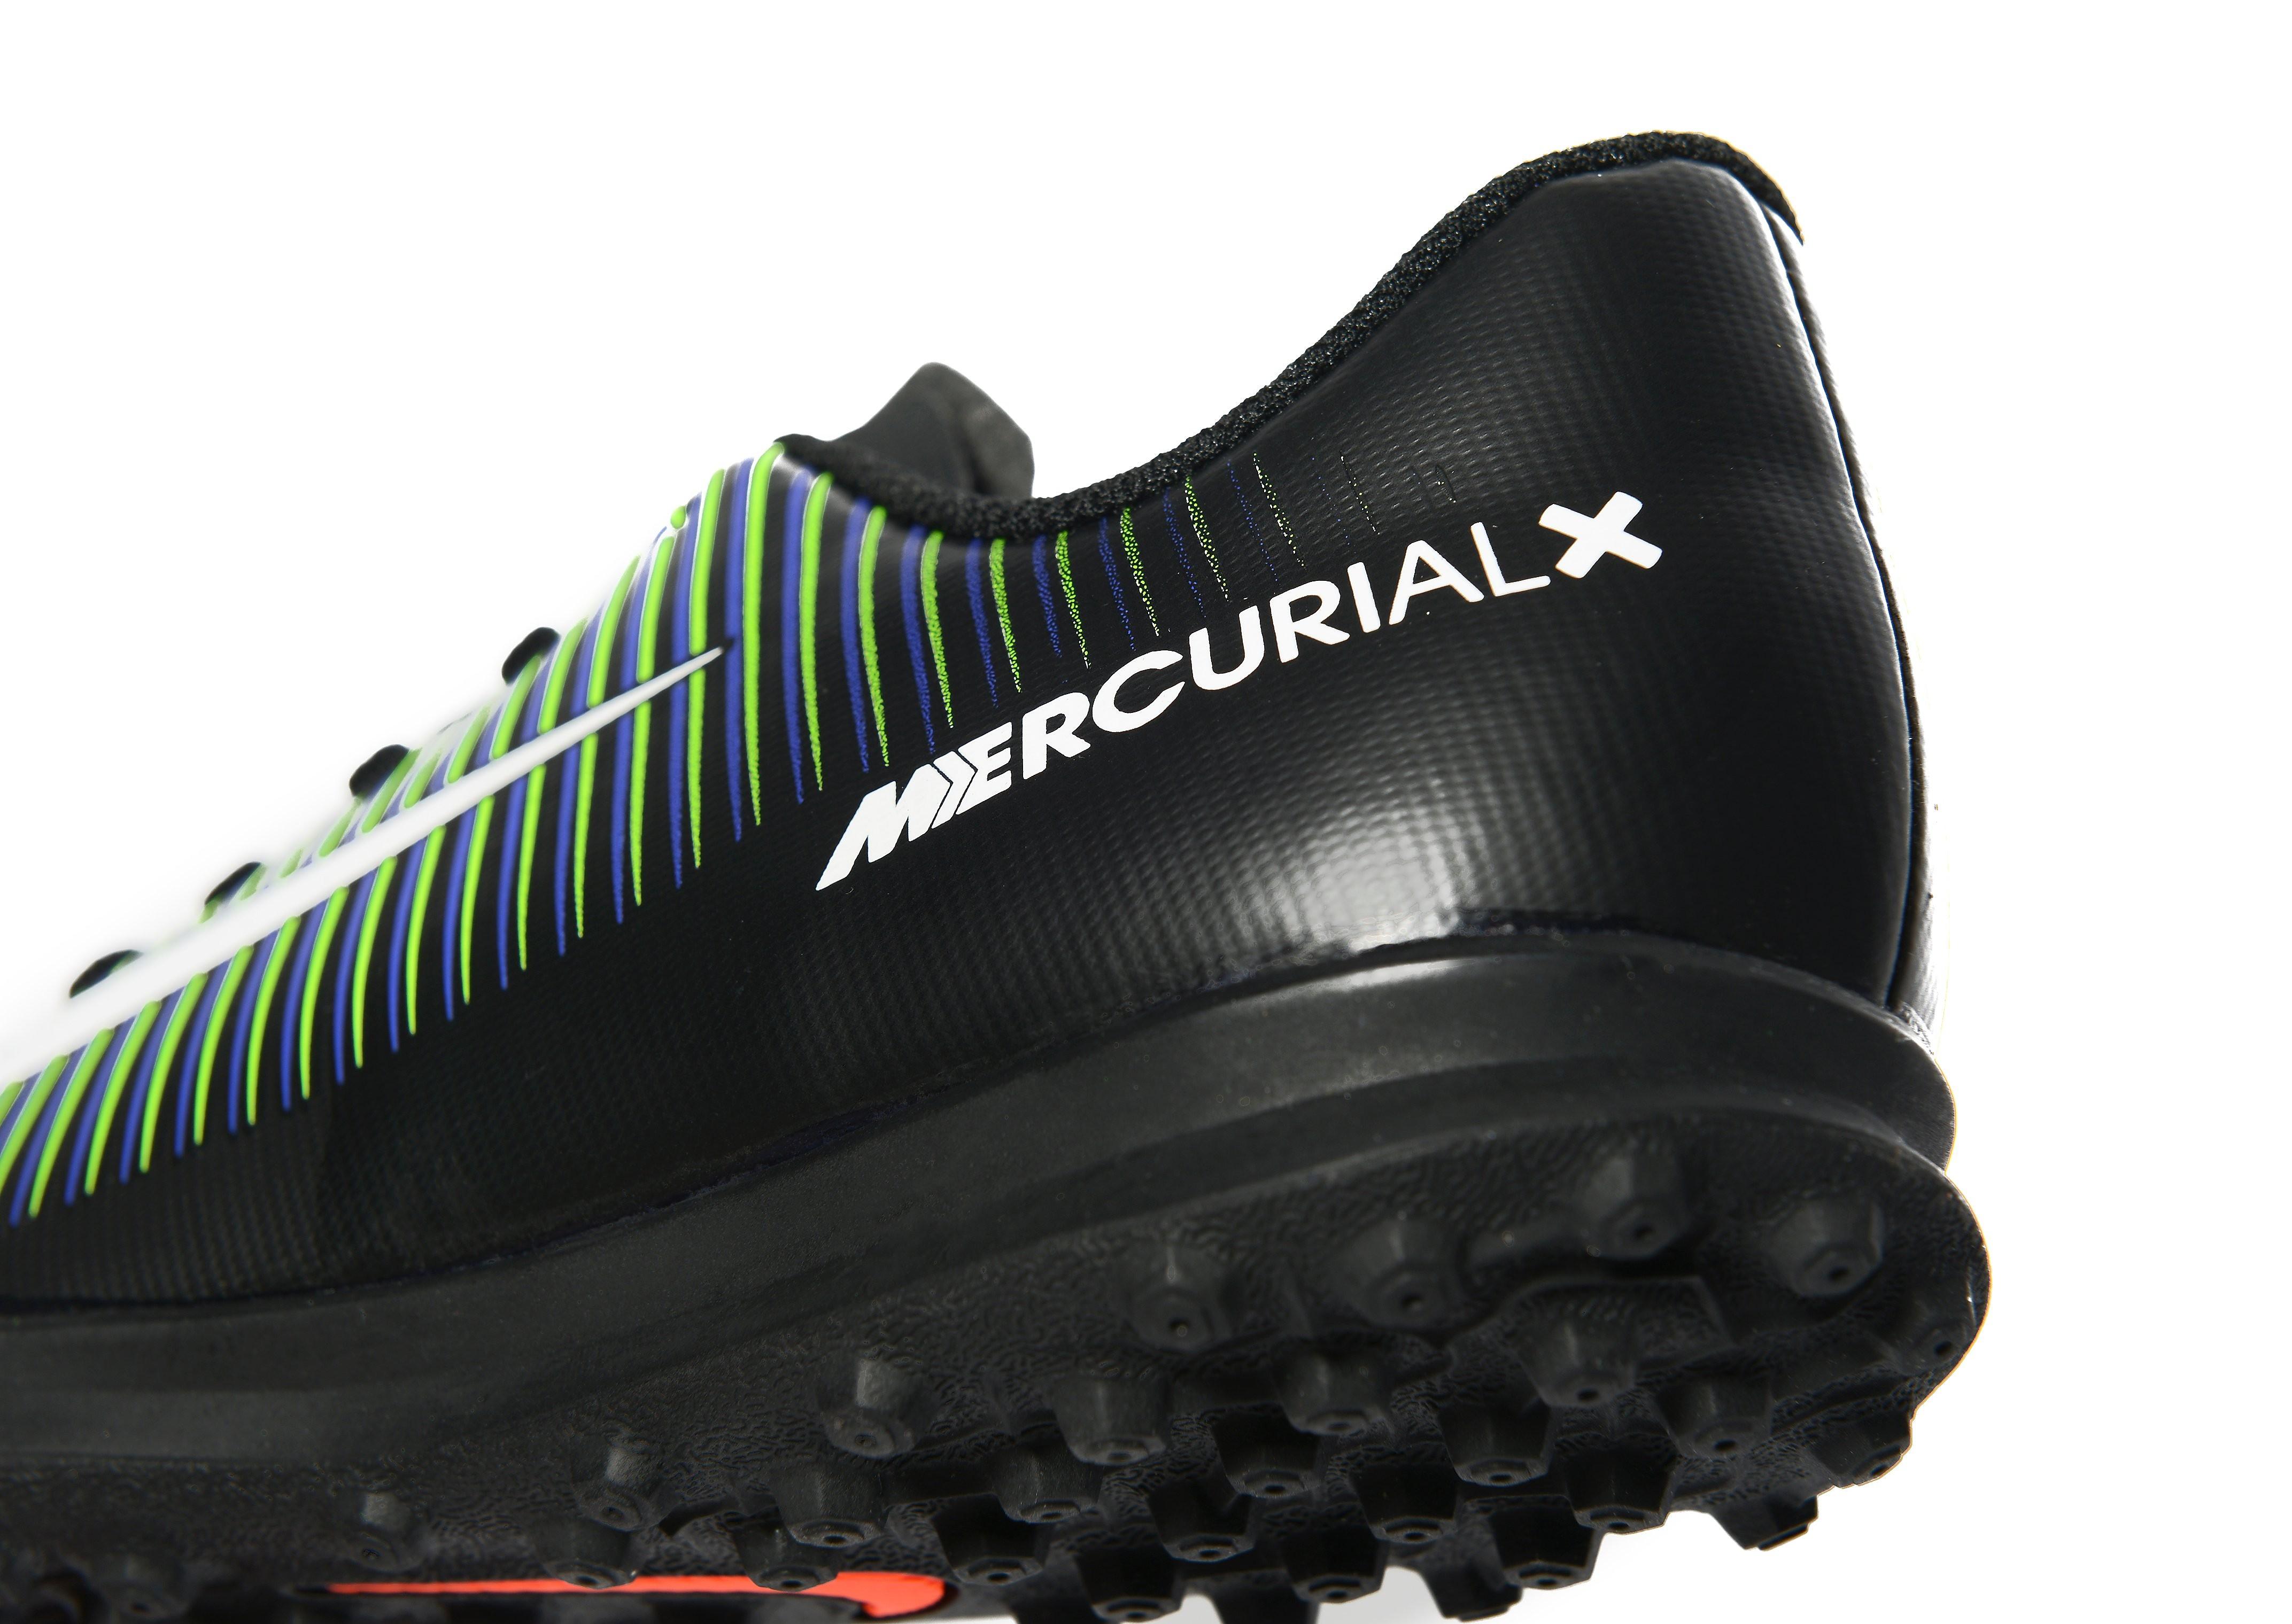 Nike Dark Lightning MercurialX Vortex III Turf Children